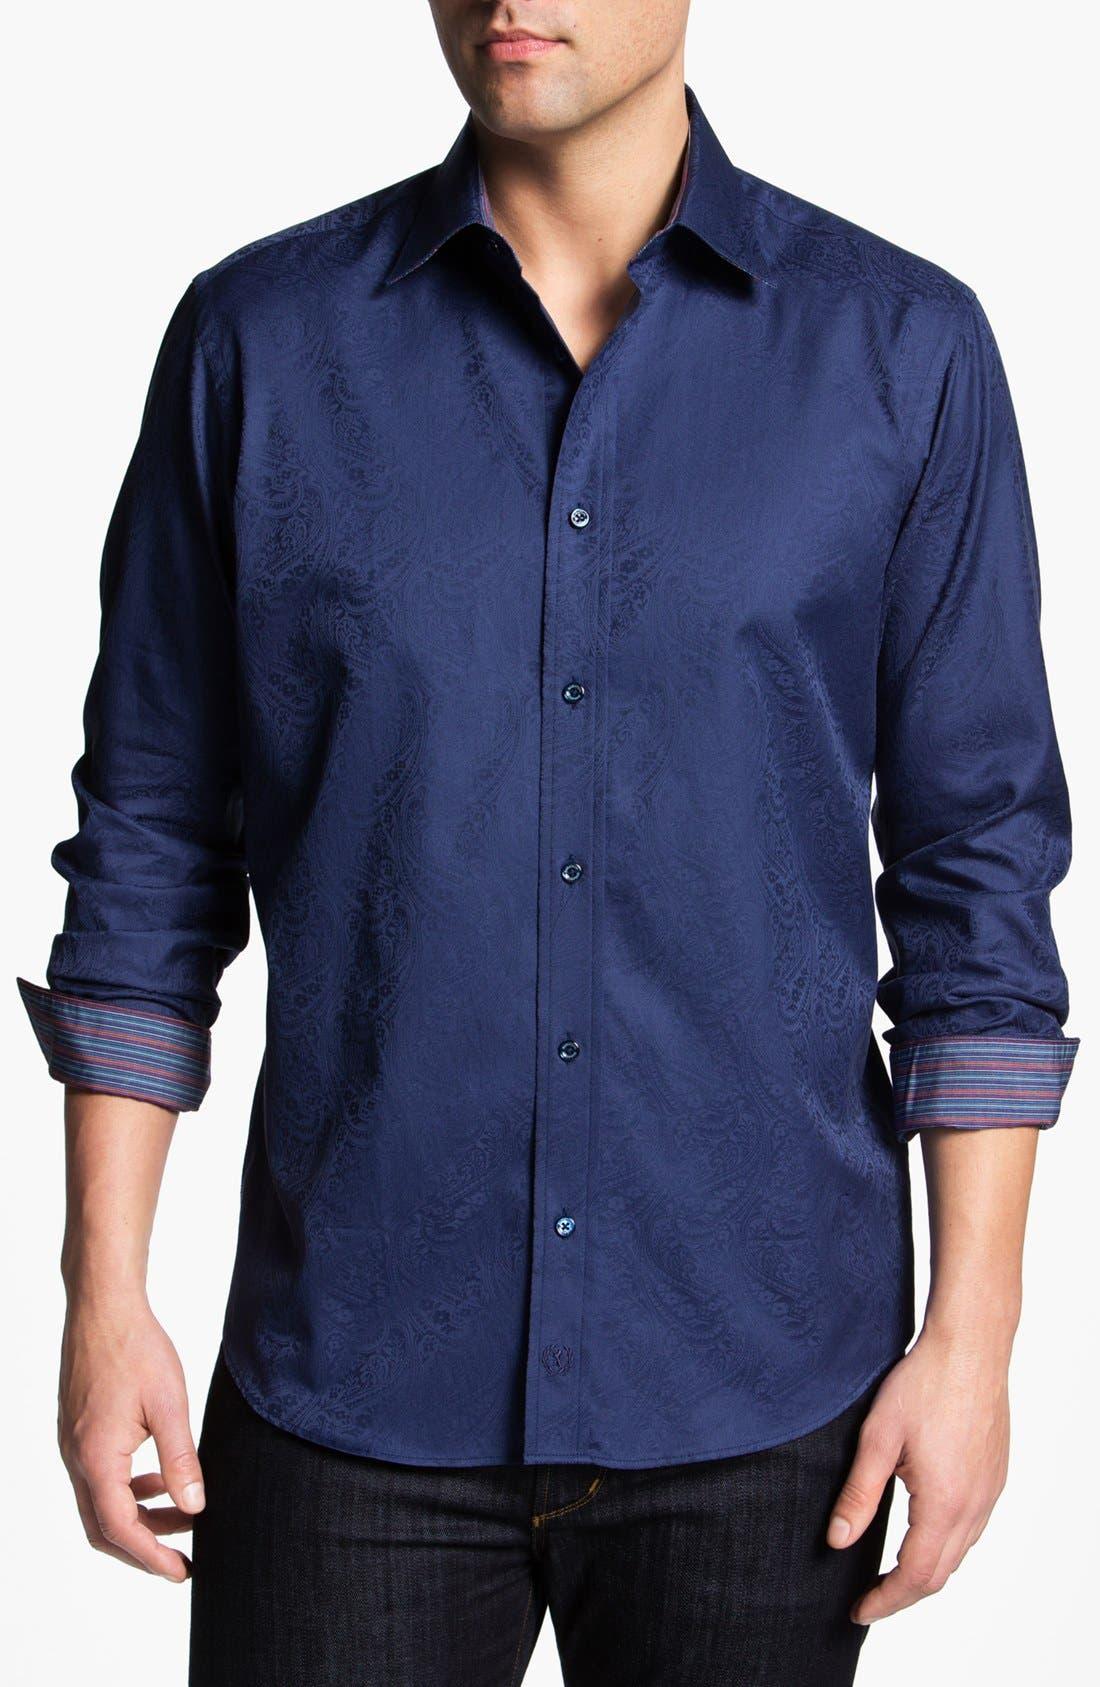 Alternate Image 1 Selected - Bugatchi Paisley Classic Fit Cotton Sport Shirt